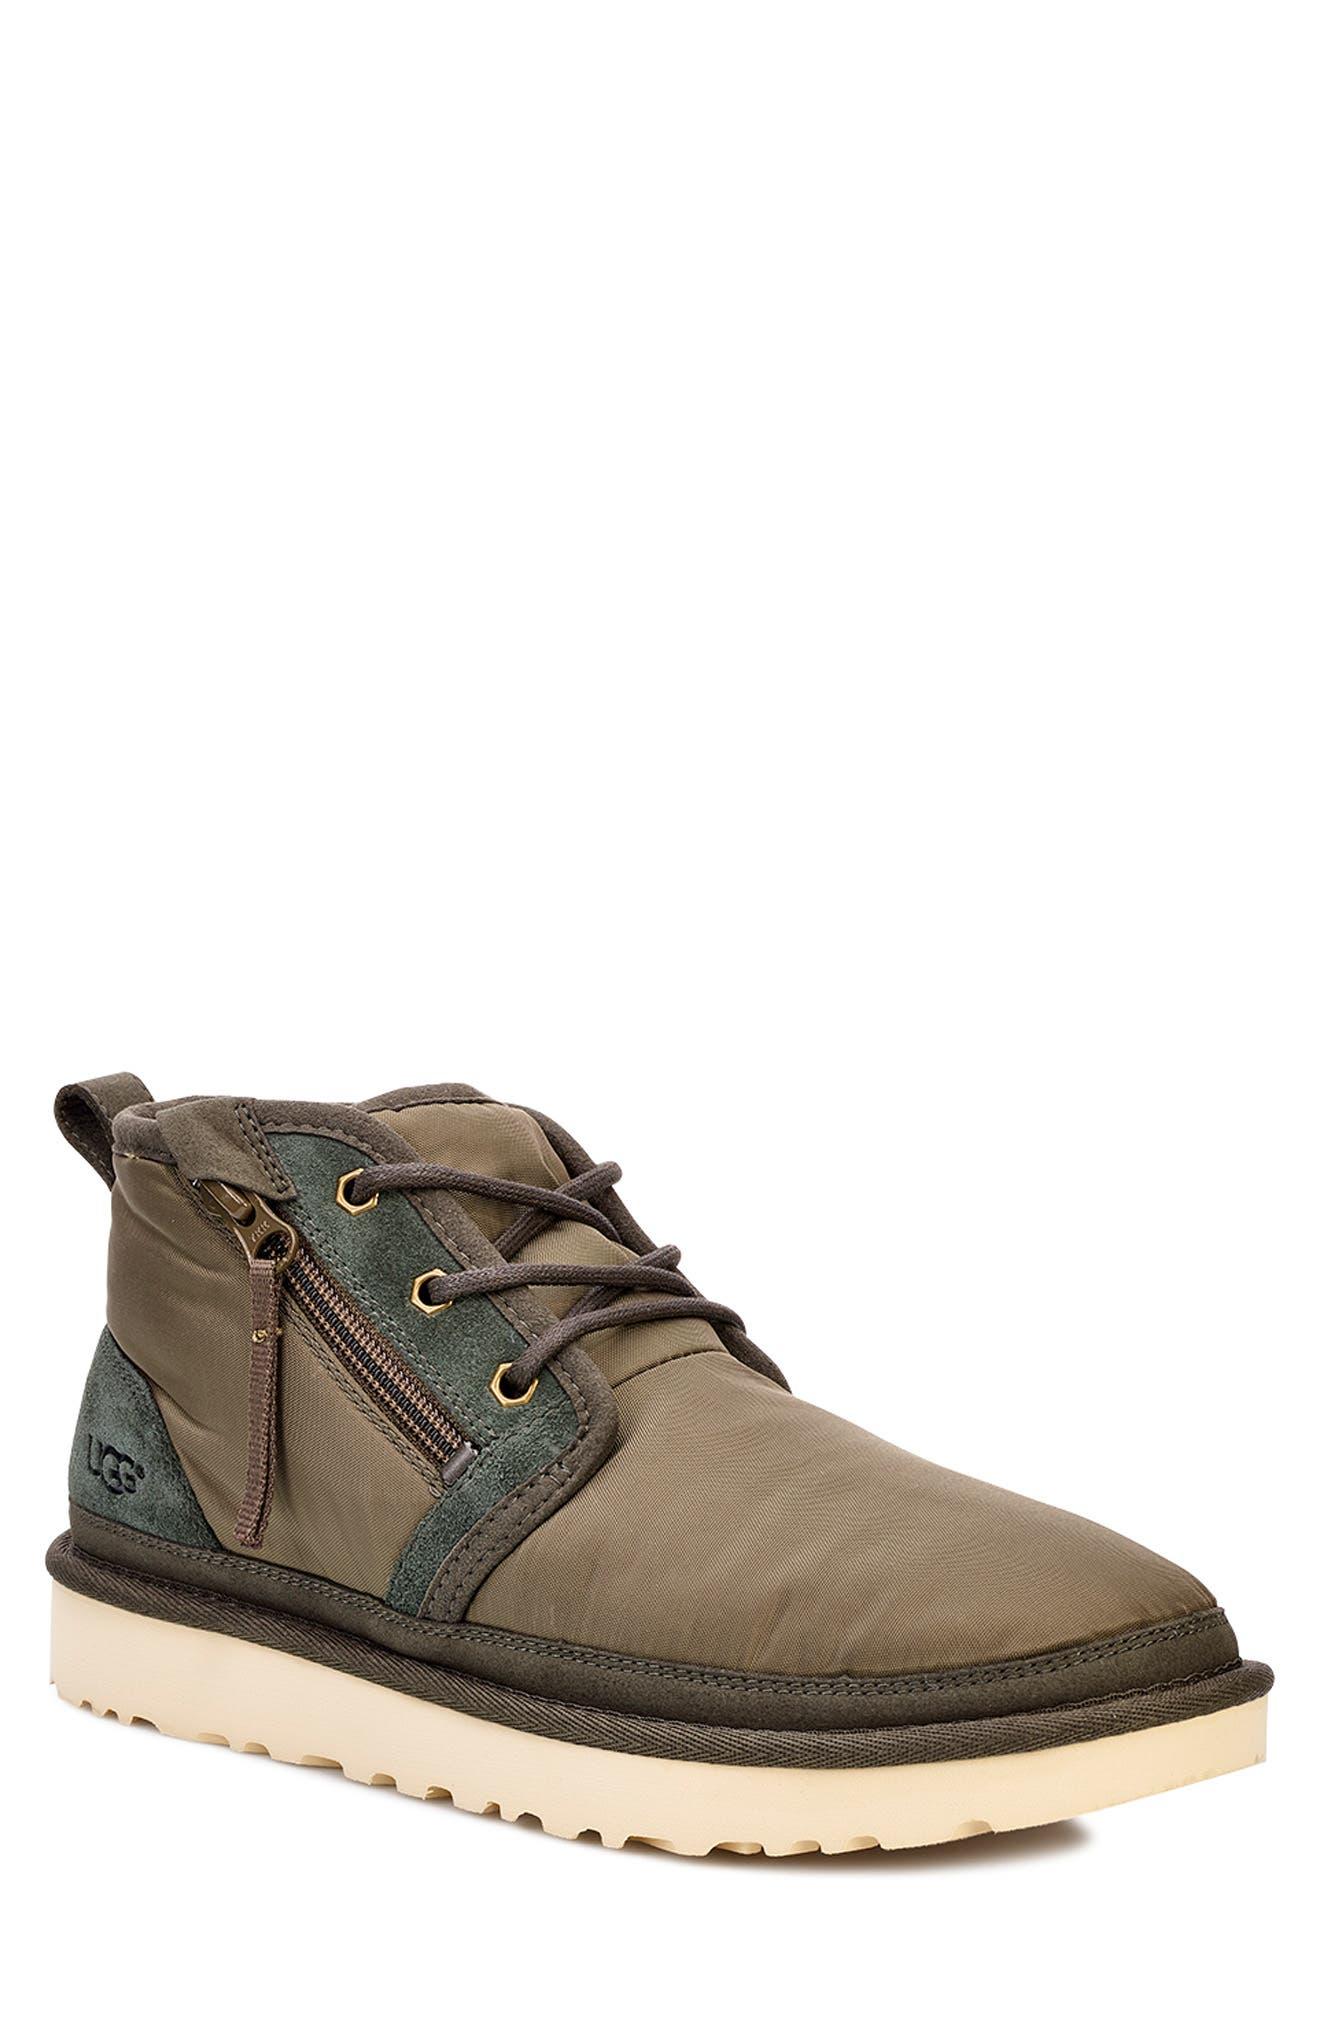 Ugg Neumel Chukka Boot, Green